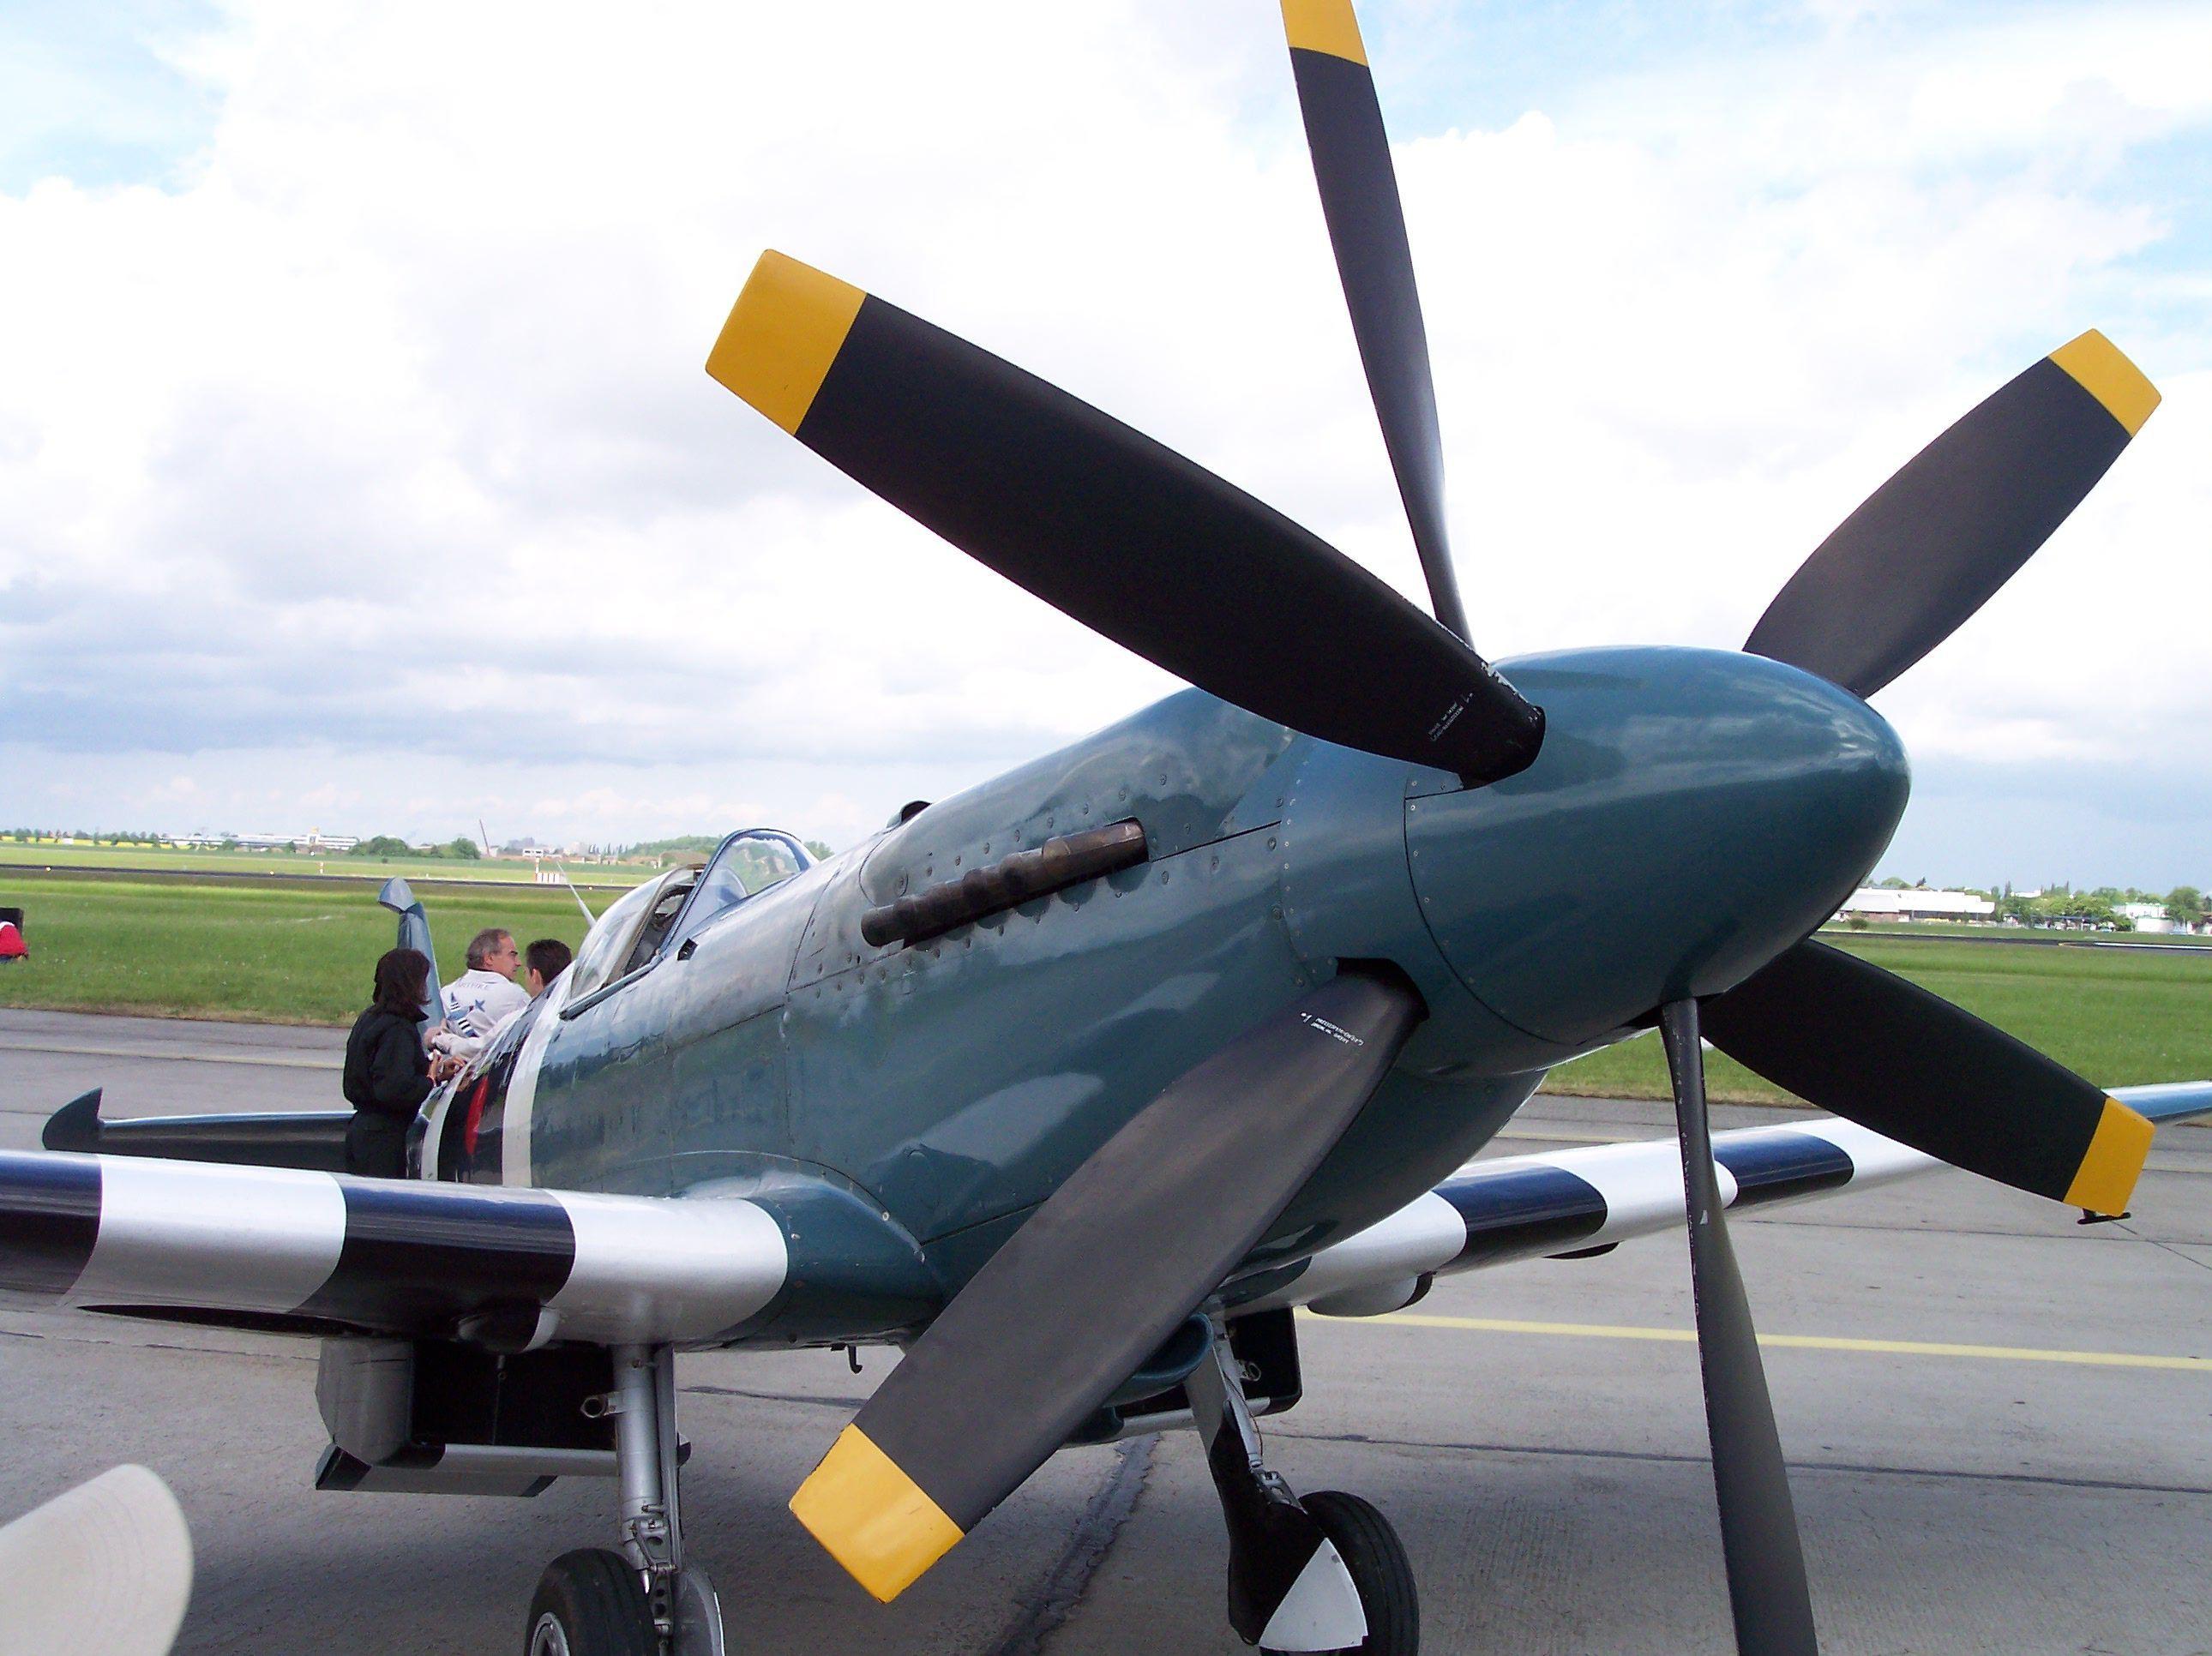 Supermarine_Spitfire_XIX_vr.jpg 2,580×1,932 pixels